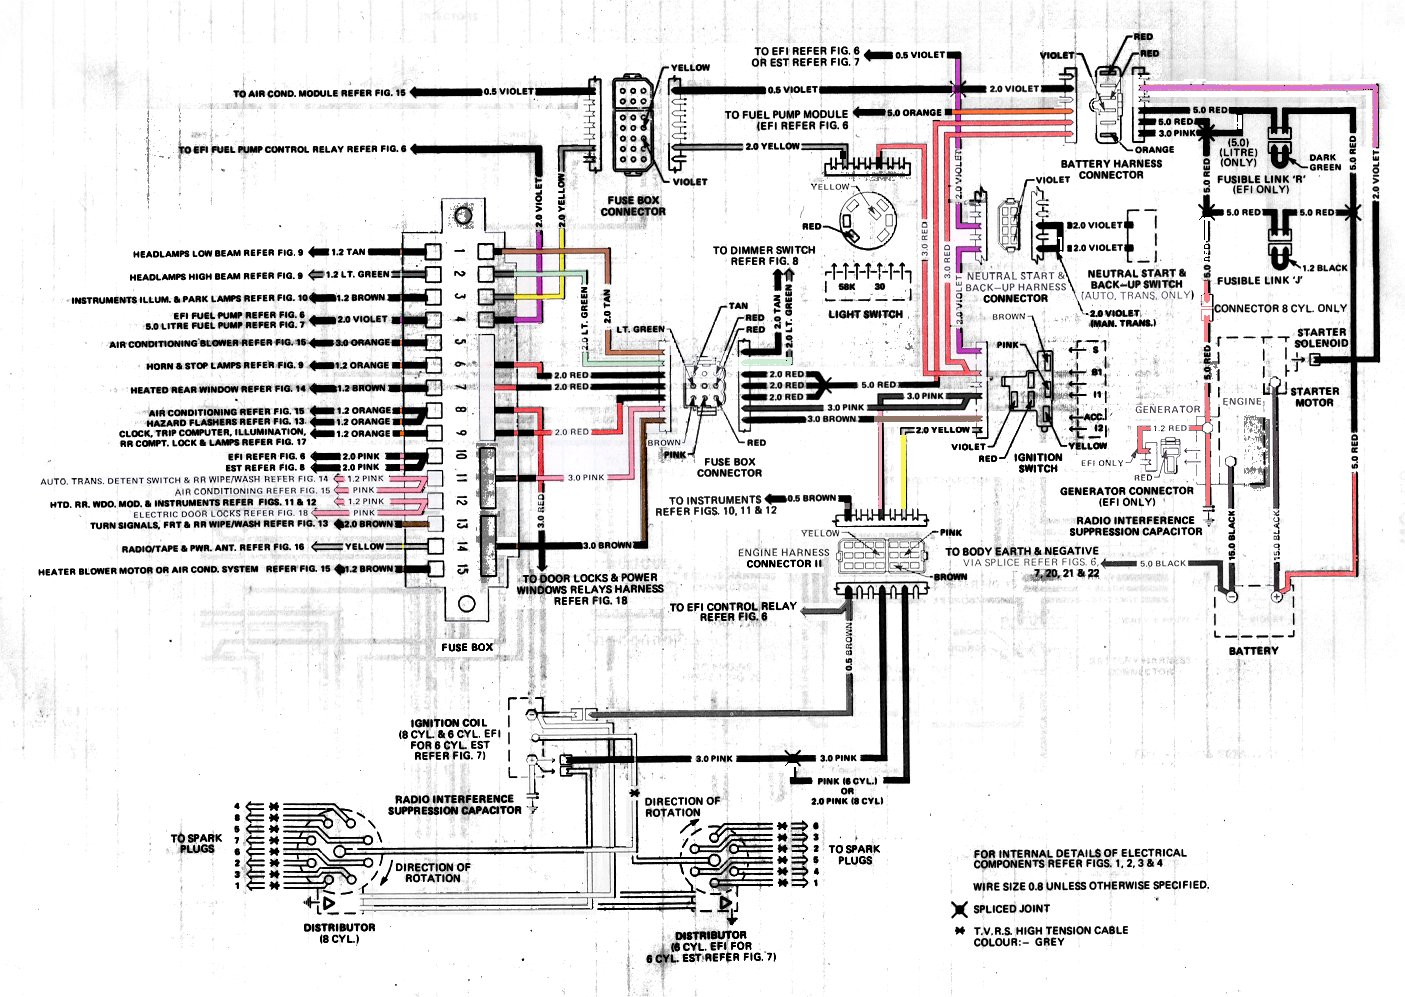 hight resolution of free circuit simulator download circuit construction kit free download circuit simulator free download 3d origami diagram